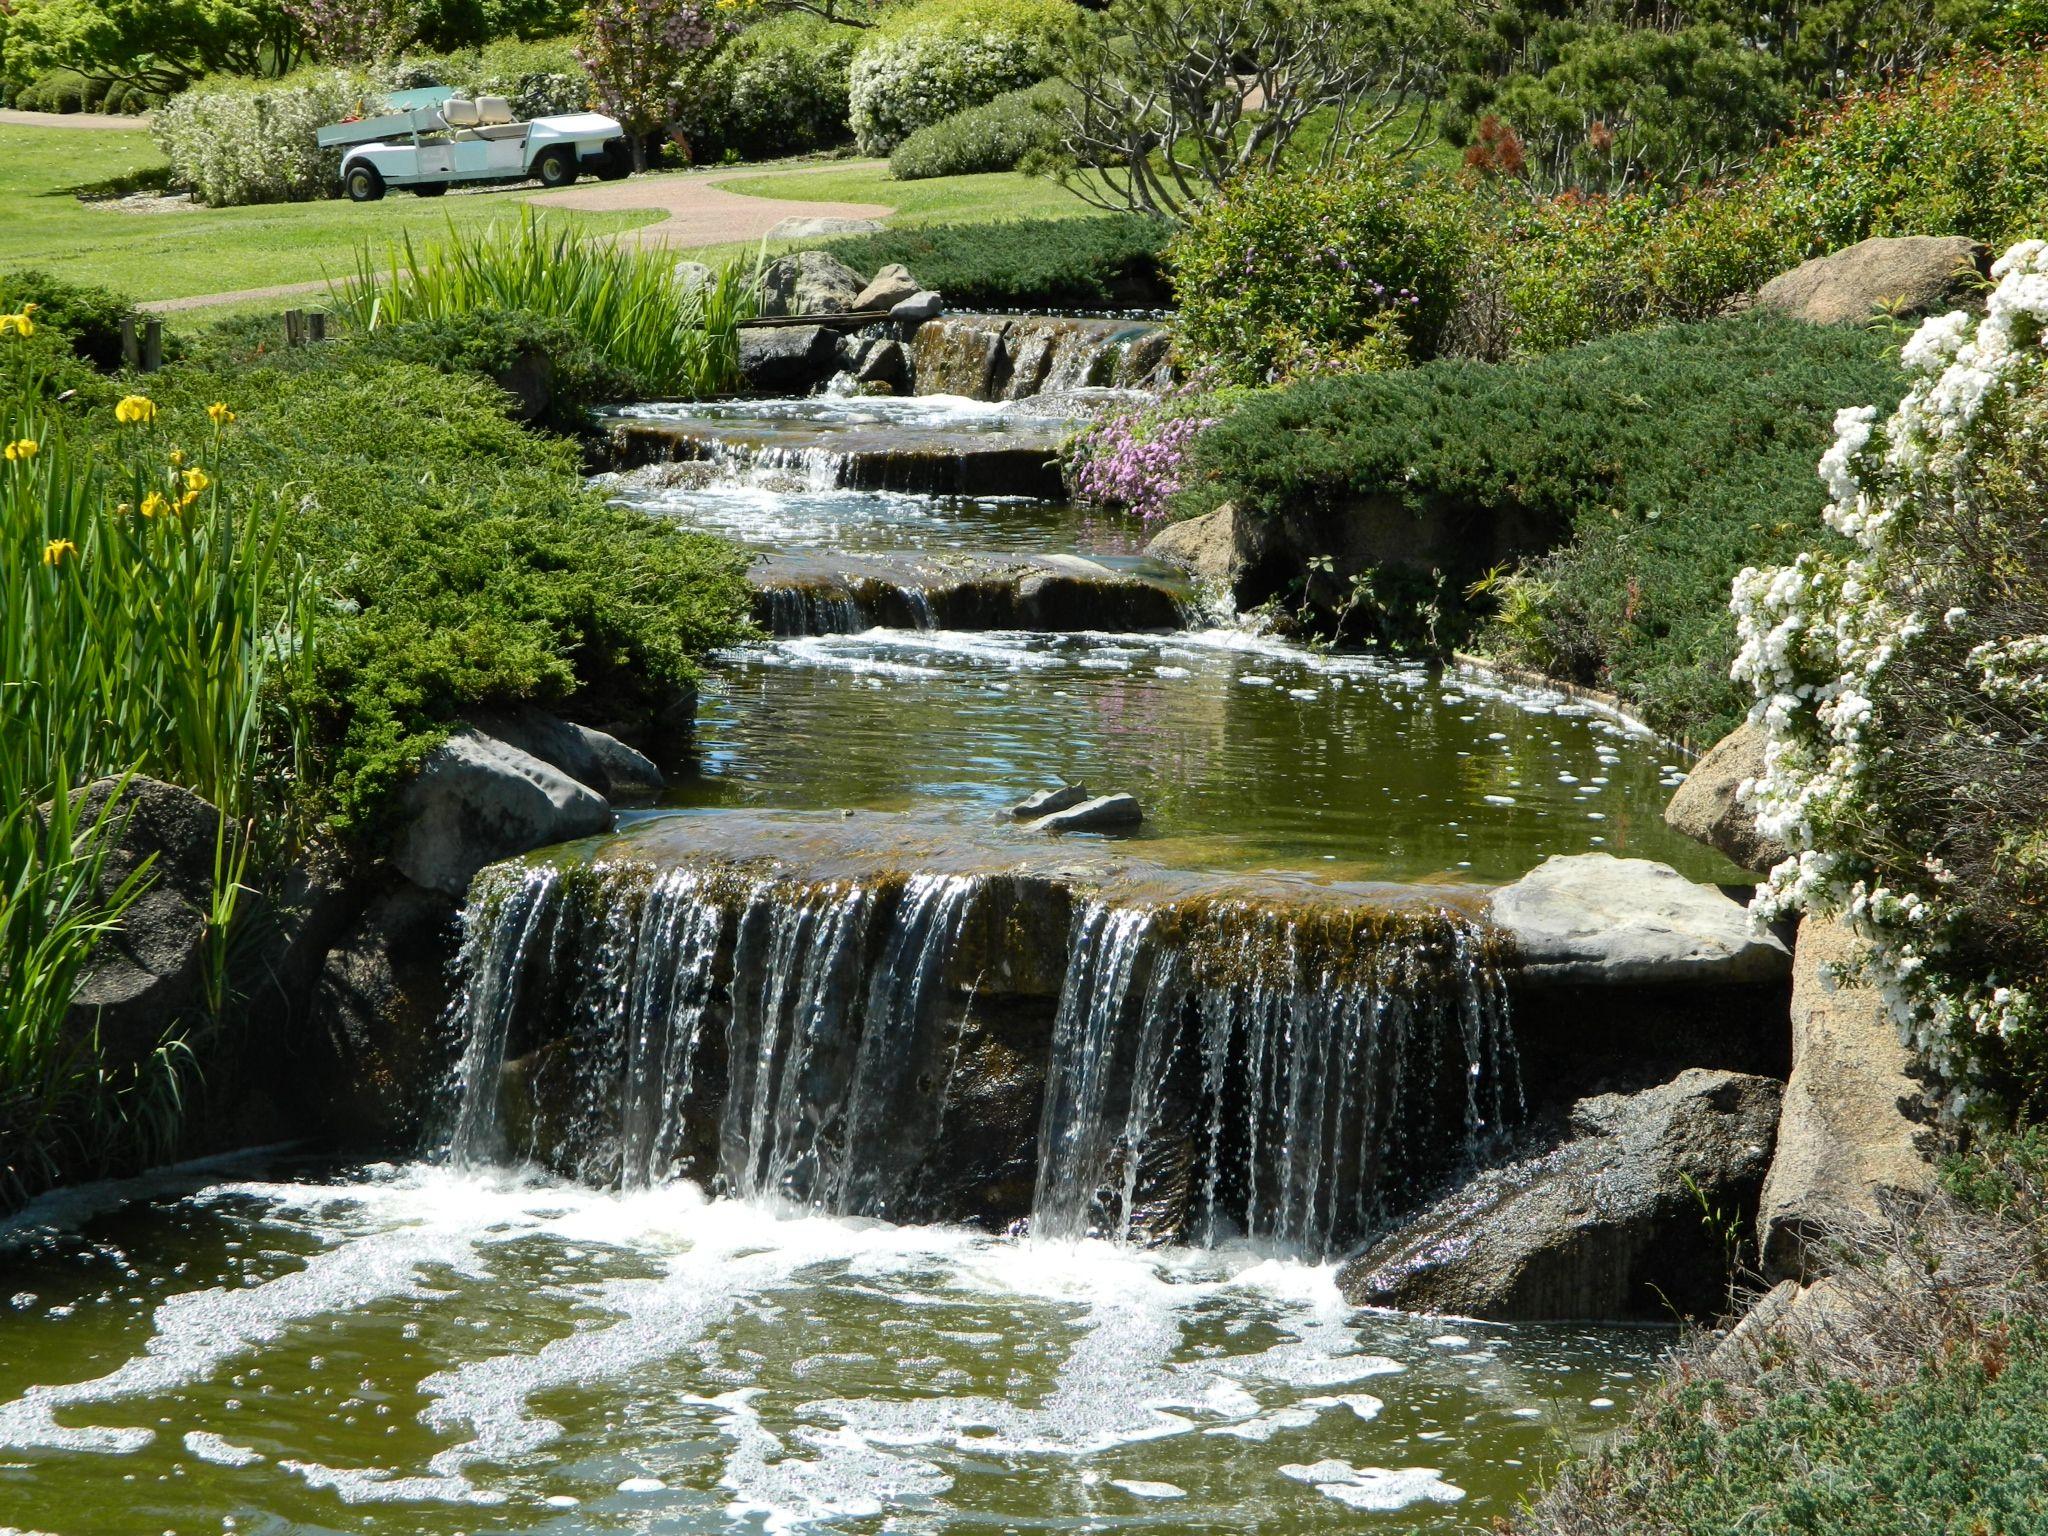 f0bbaadb092d5ecaf093ecd533143088 - Best Time To Visit Cowra Japanese Gardens